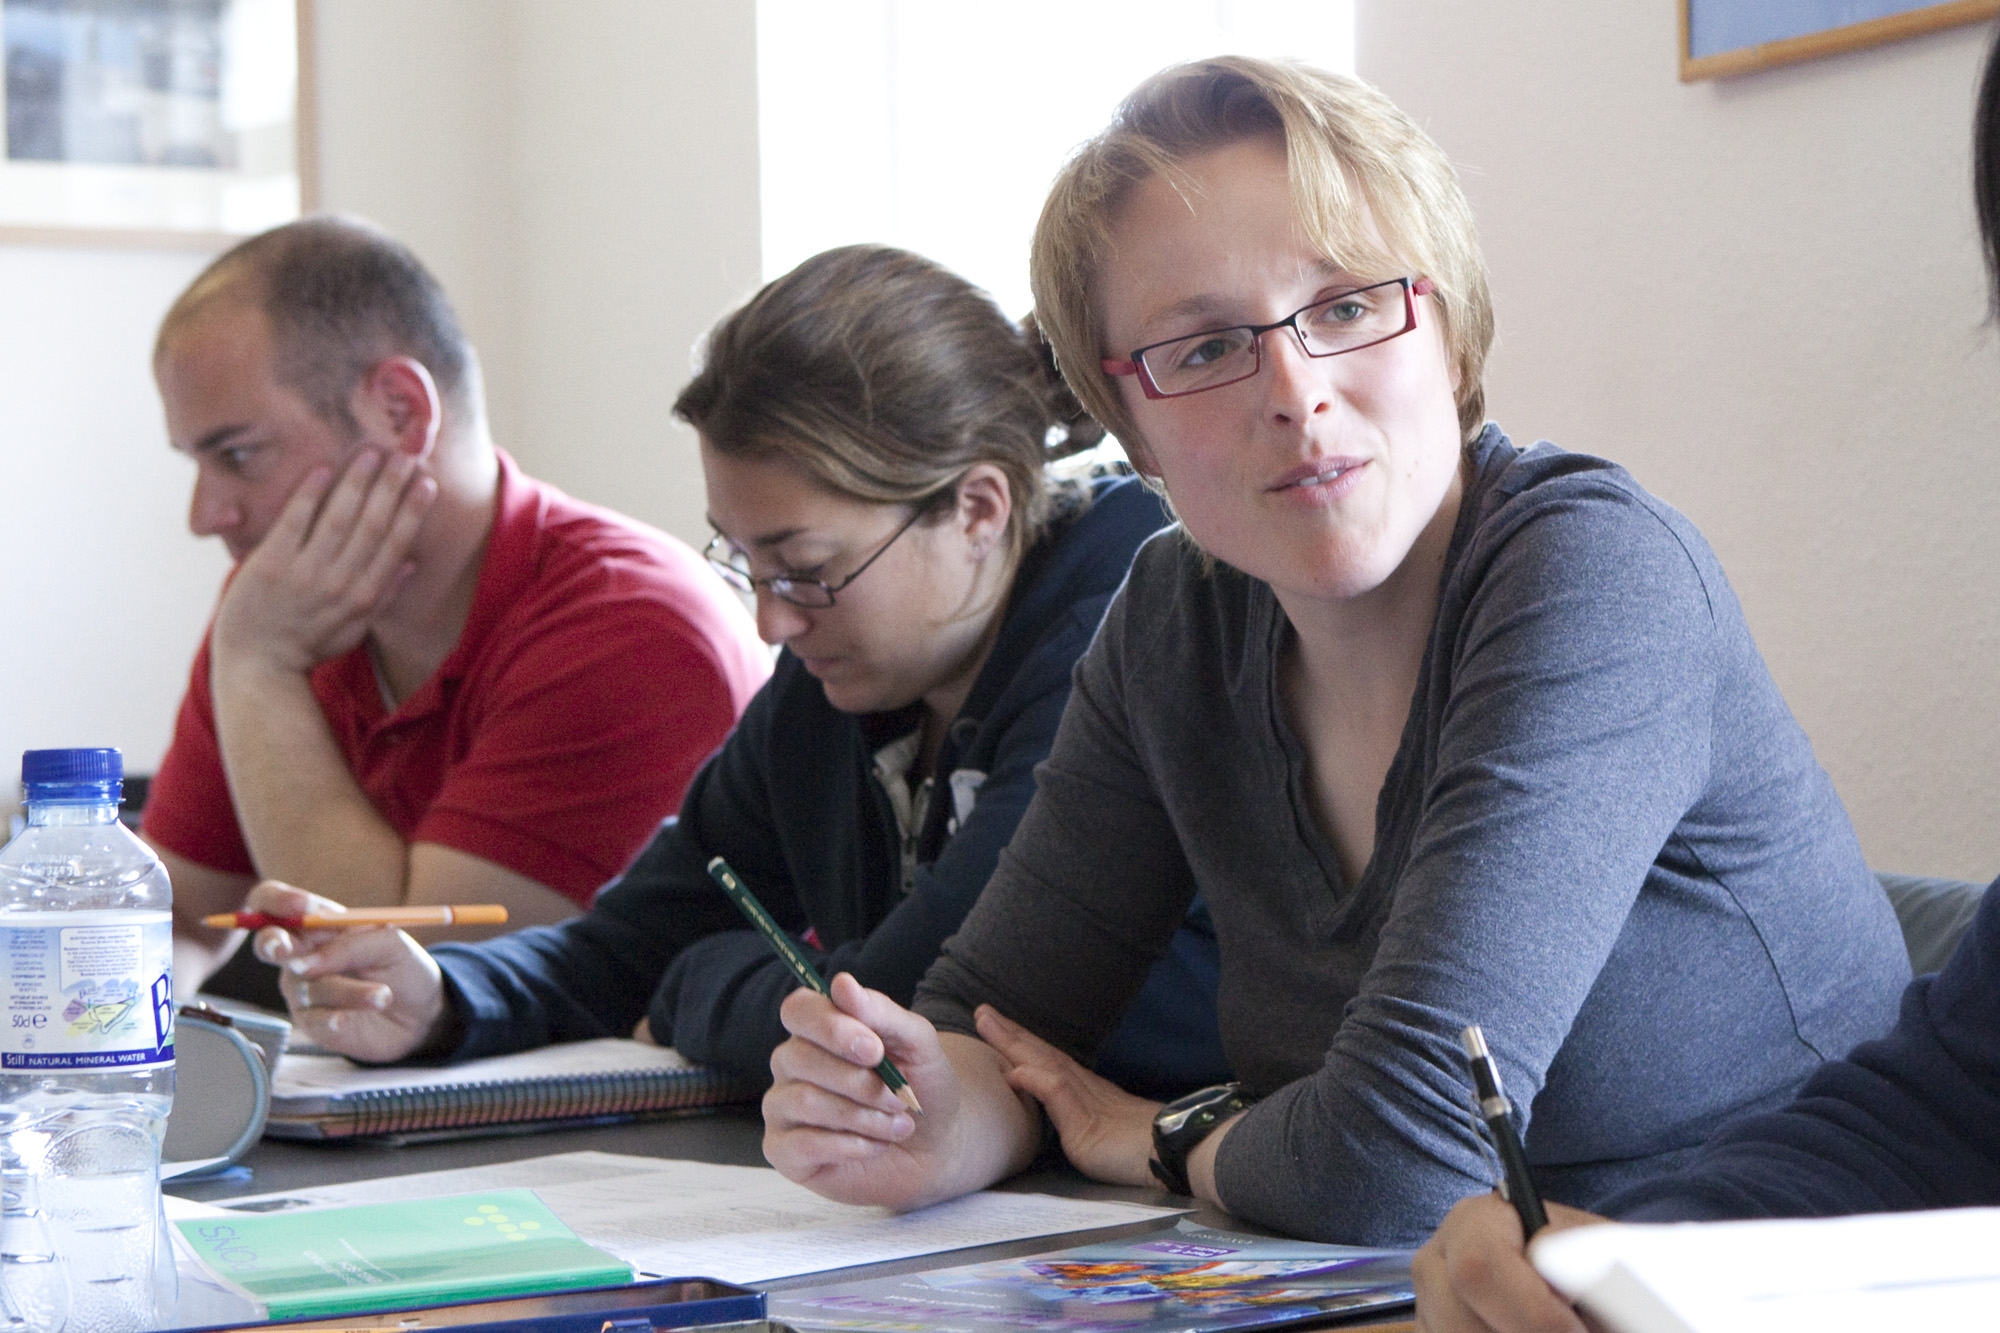 Adult learner training